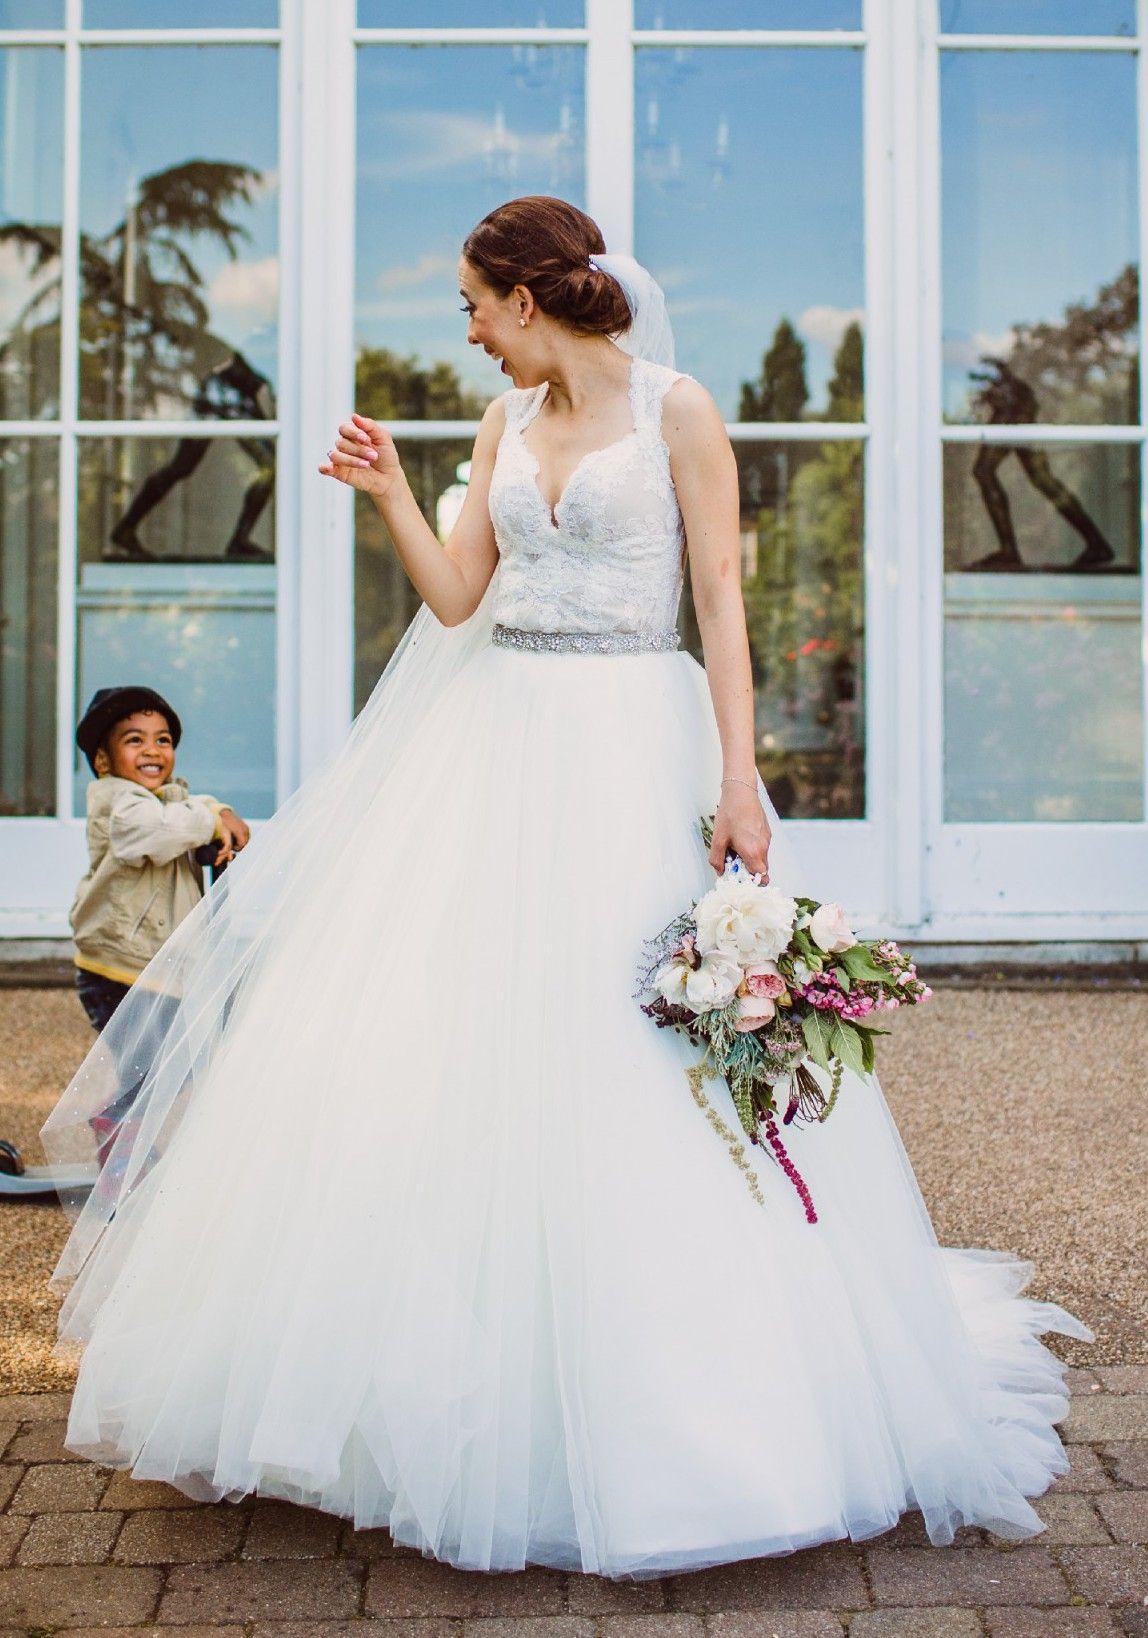 Wtoo 14603 Used Wedding Dress Save 63 Wtoo Wedding Dress Wedding Dresses Used Wedding Dresses [ 1638 x 1148 Pixel ]